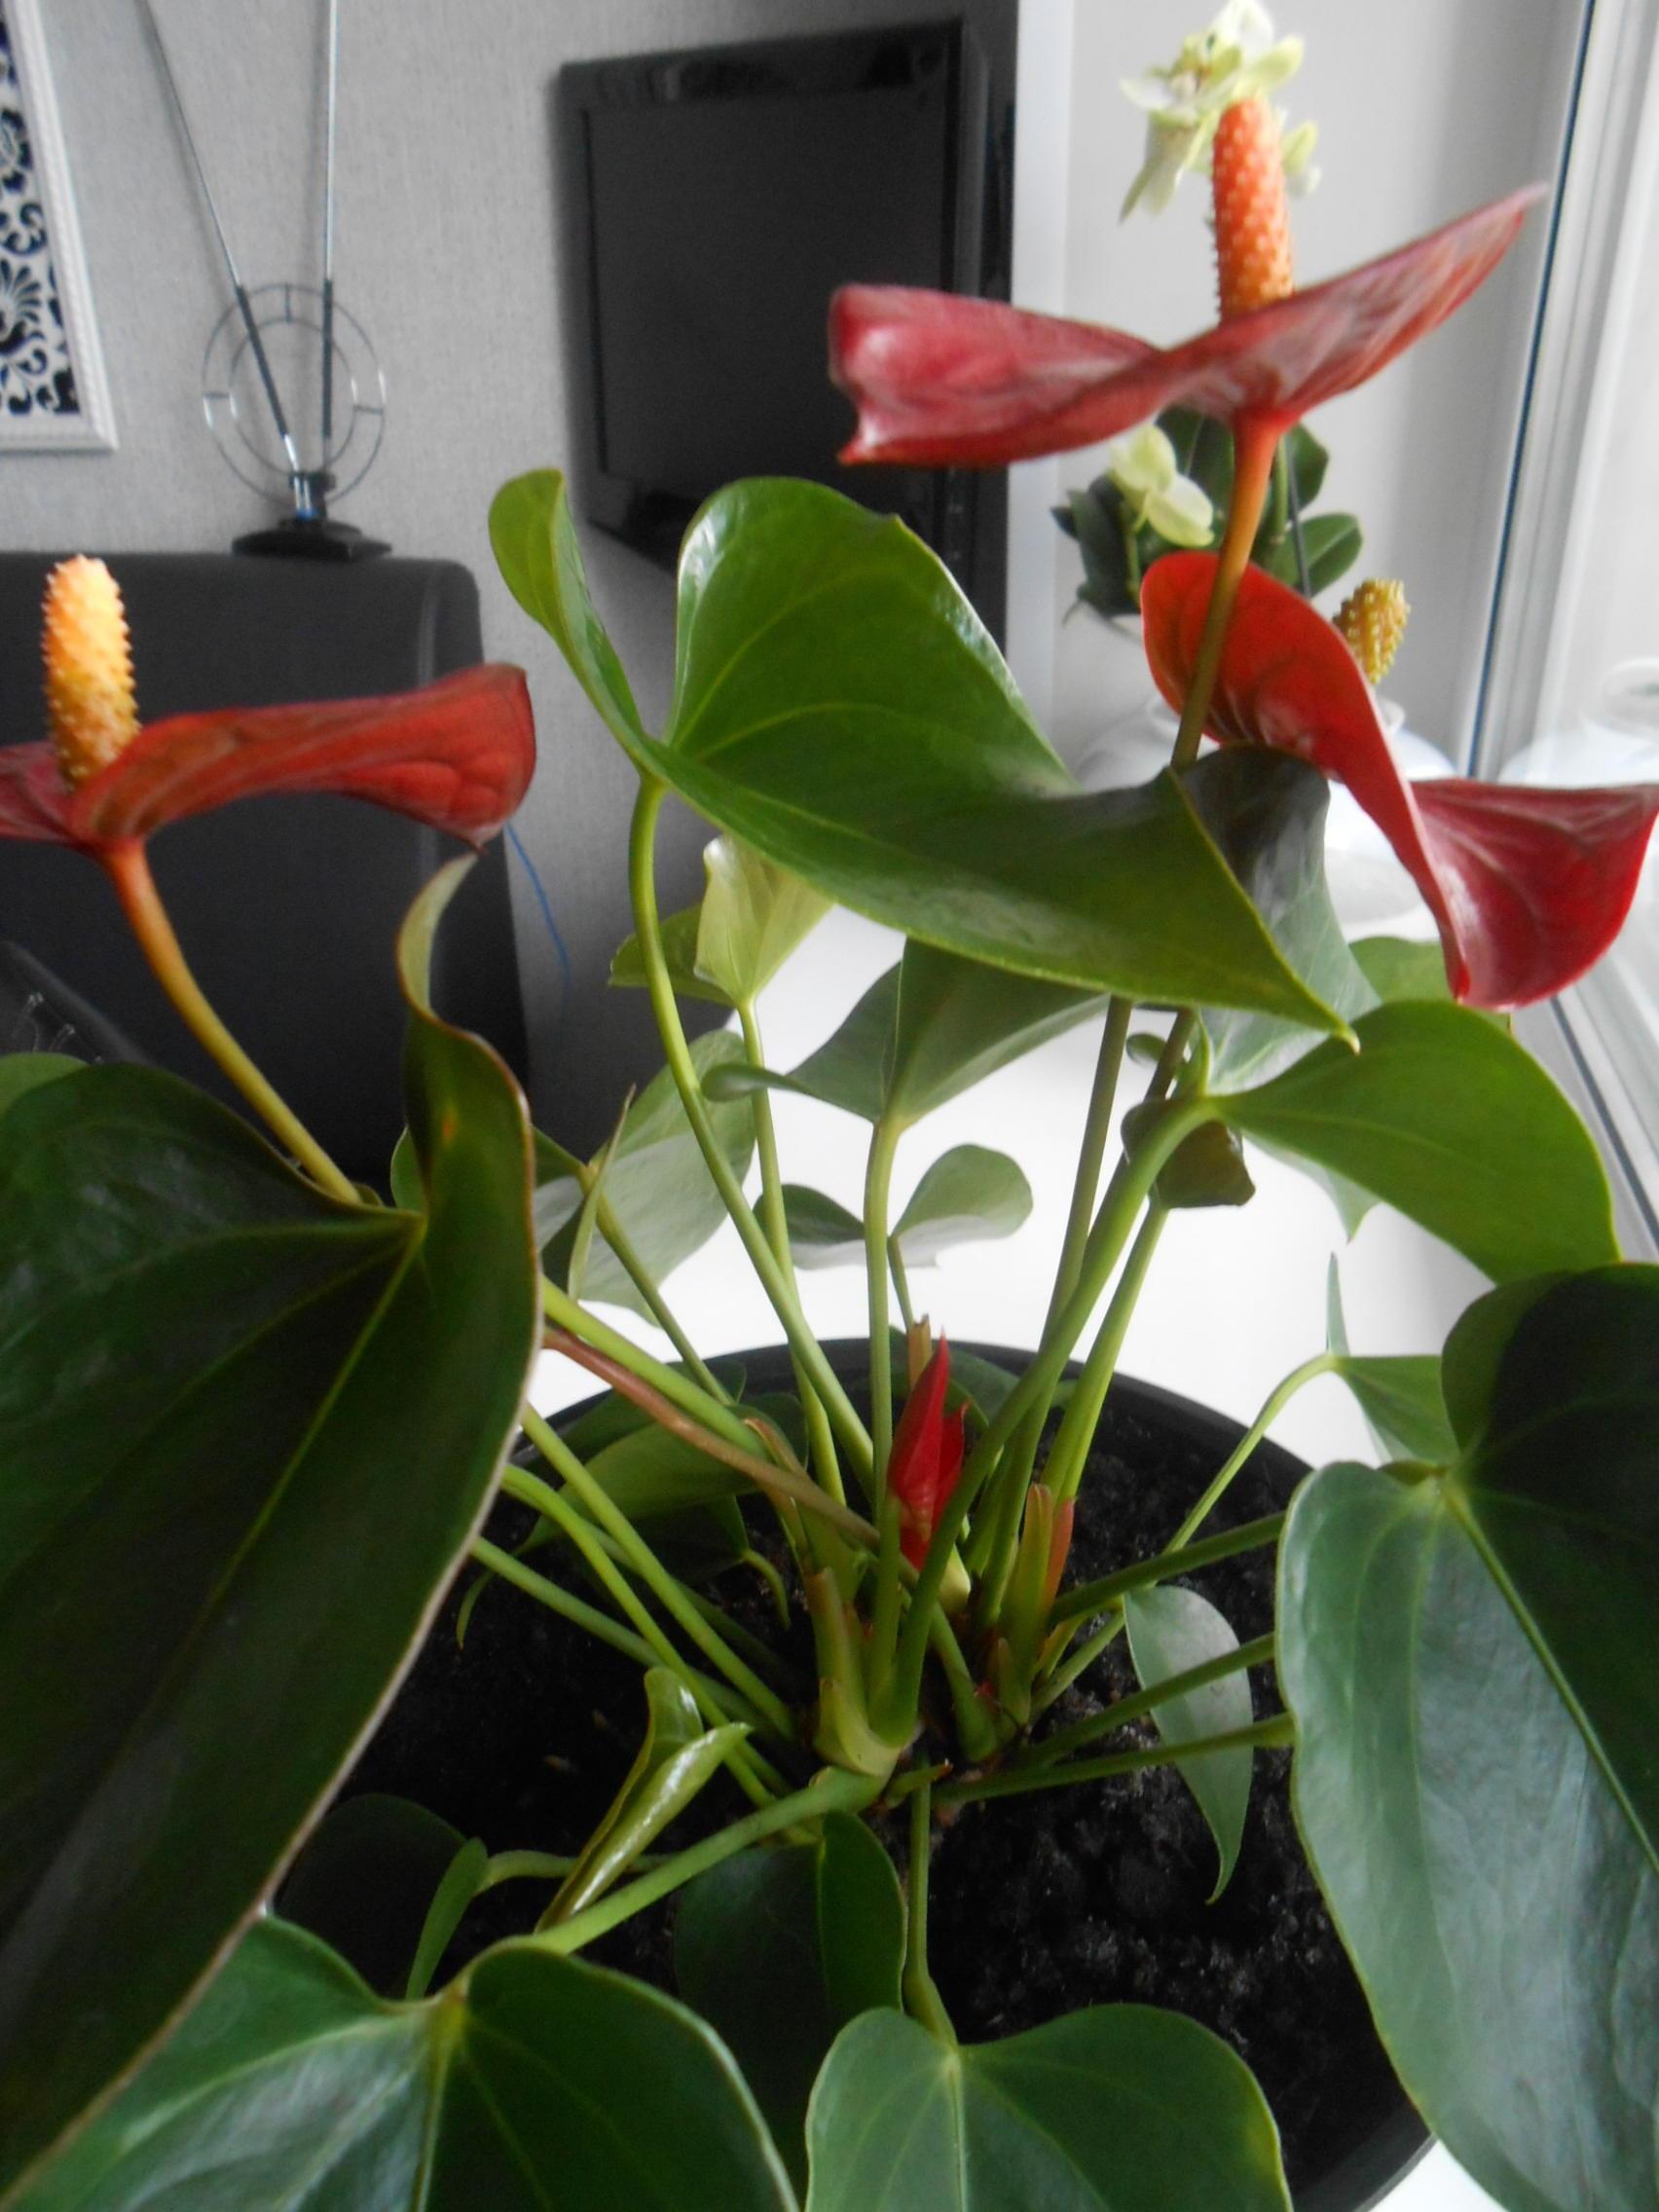 Антуриум покраснели листья дырки в листьях